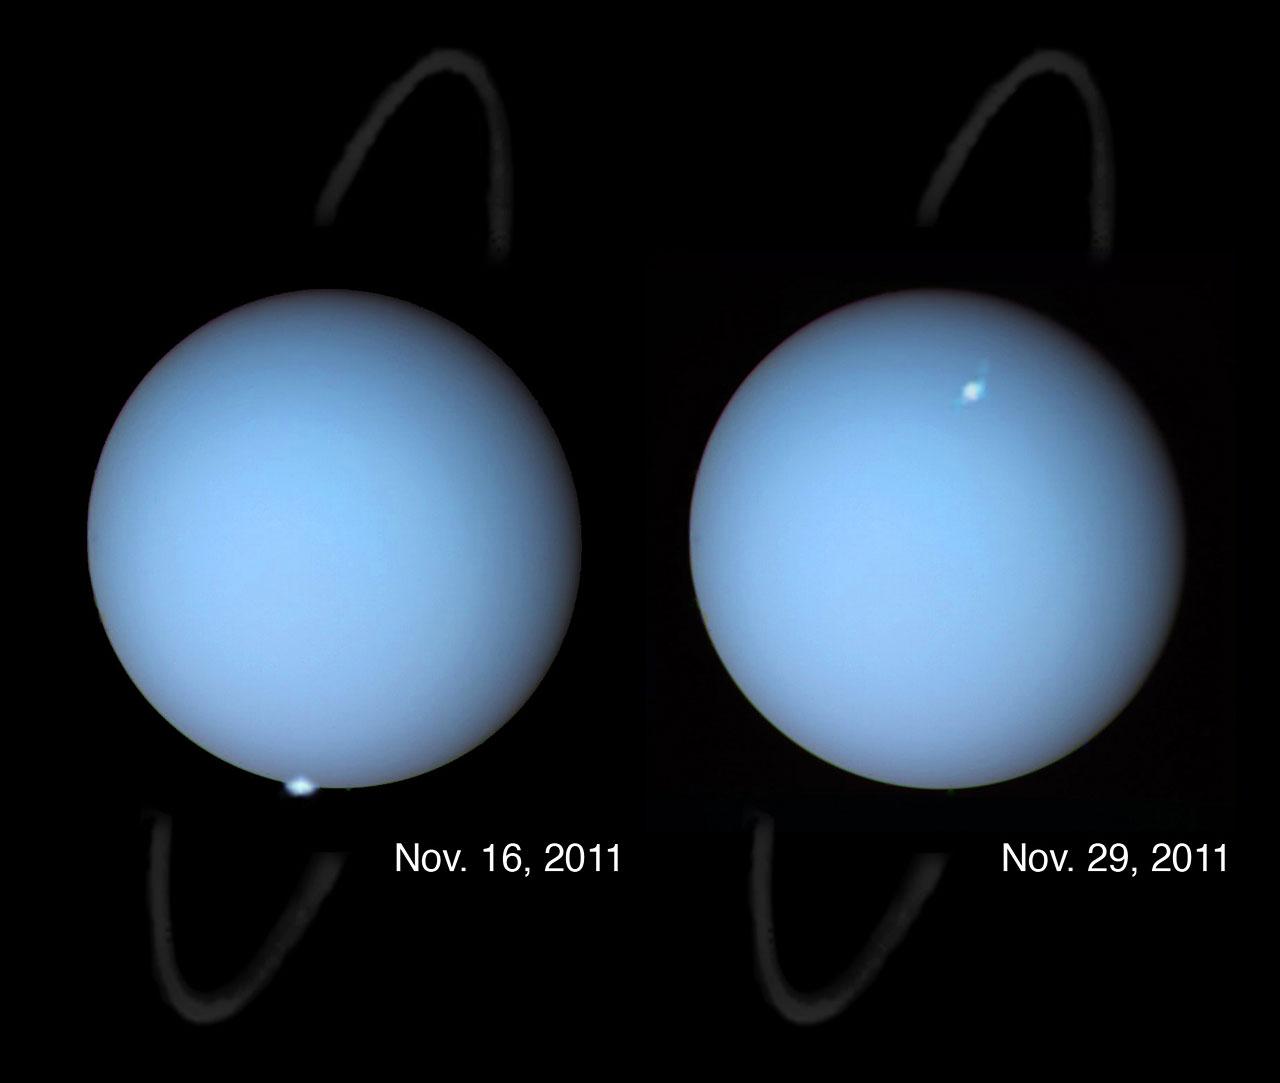 Hubble spots aurorae on the planet Uranus